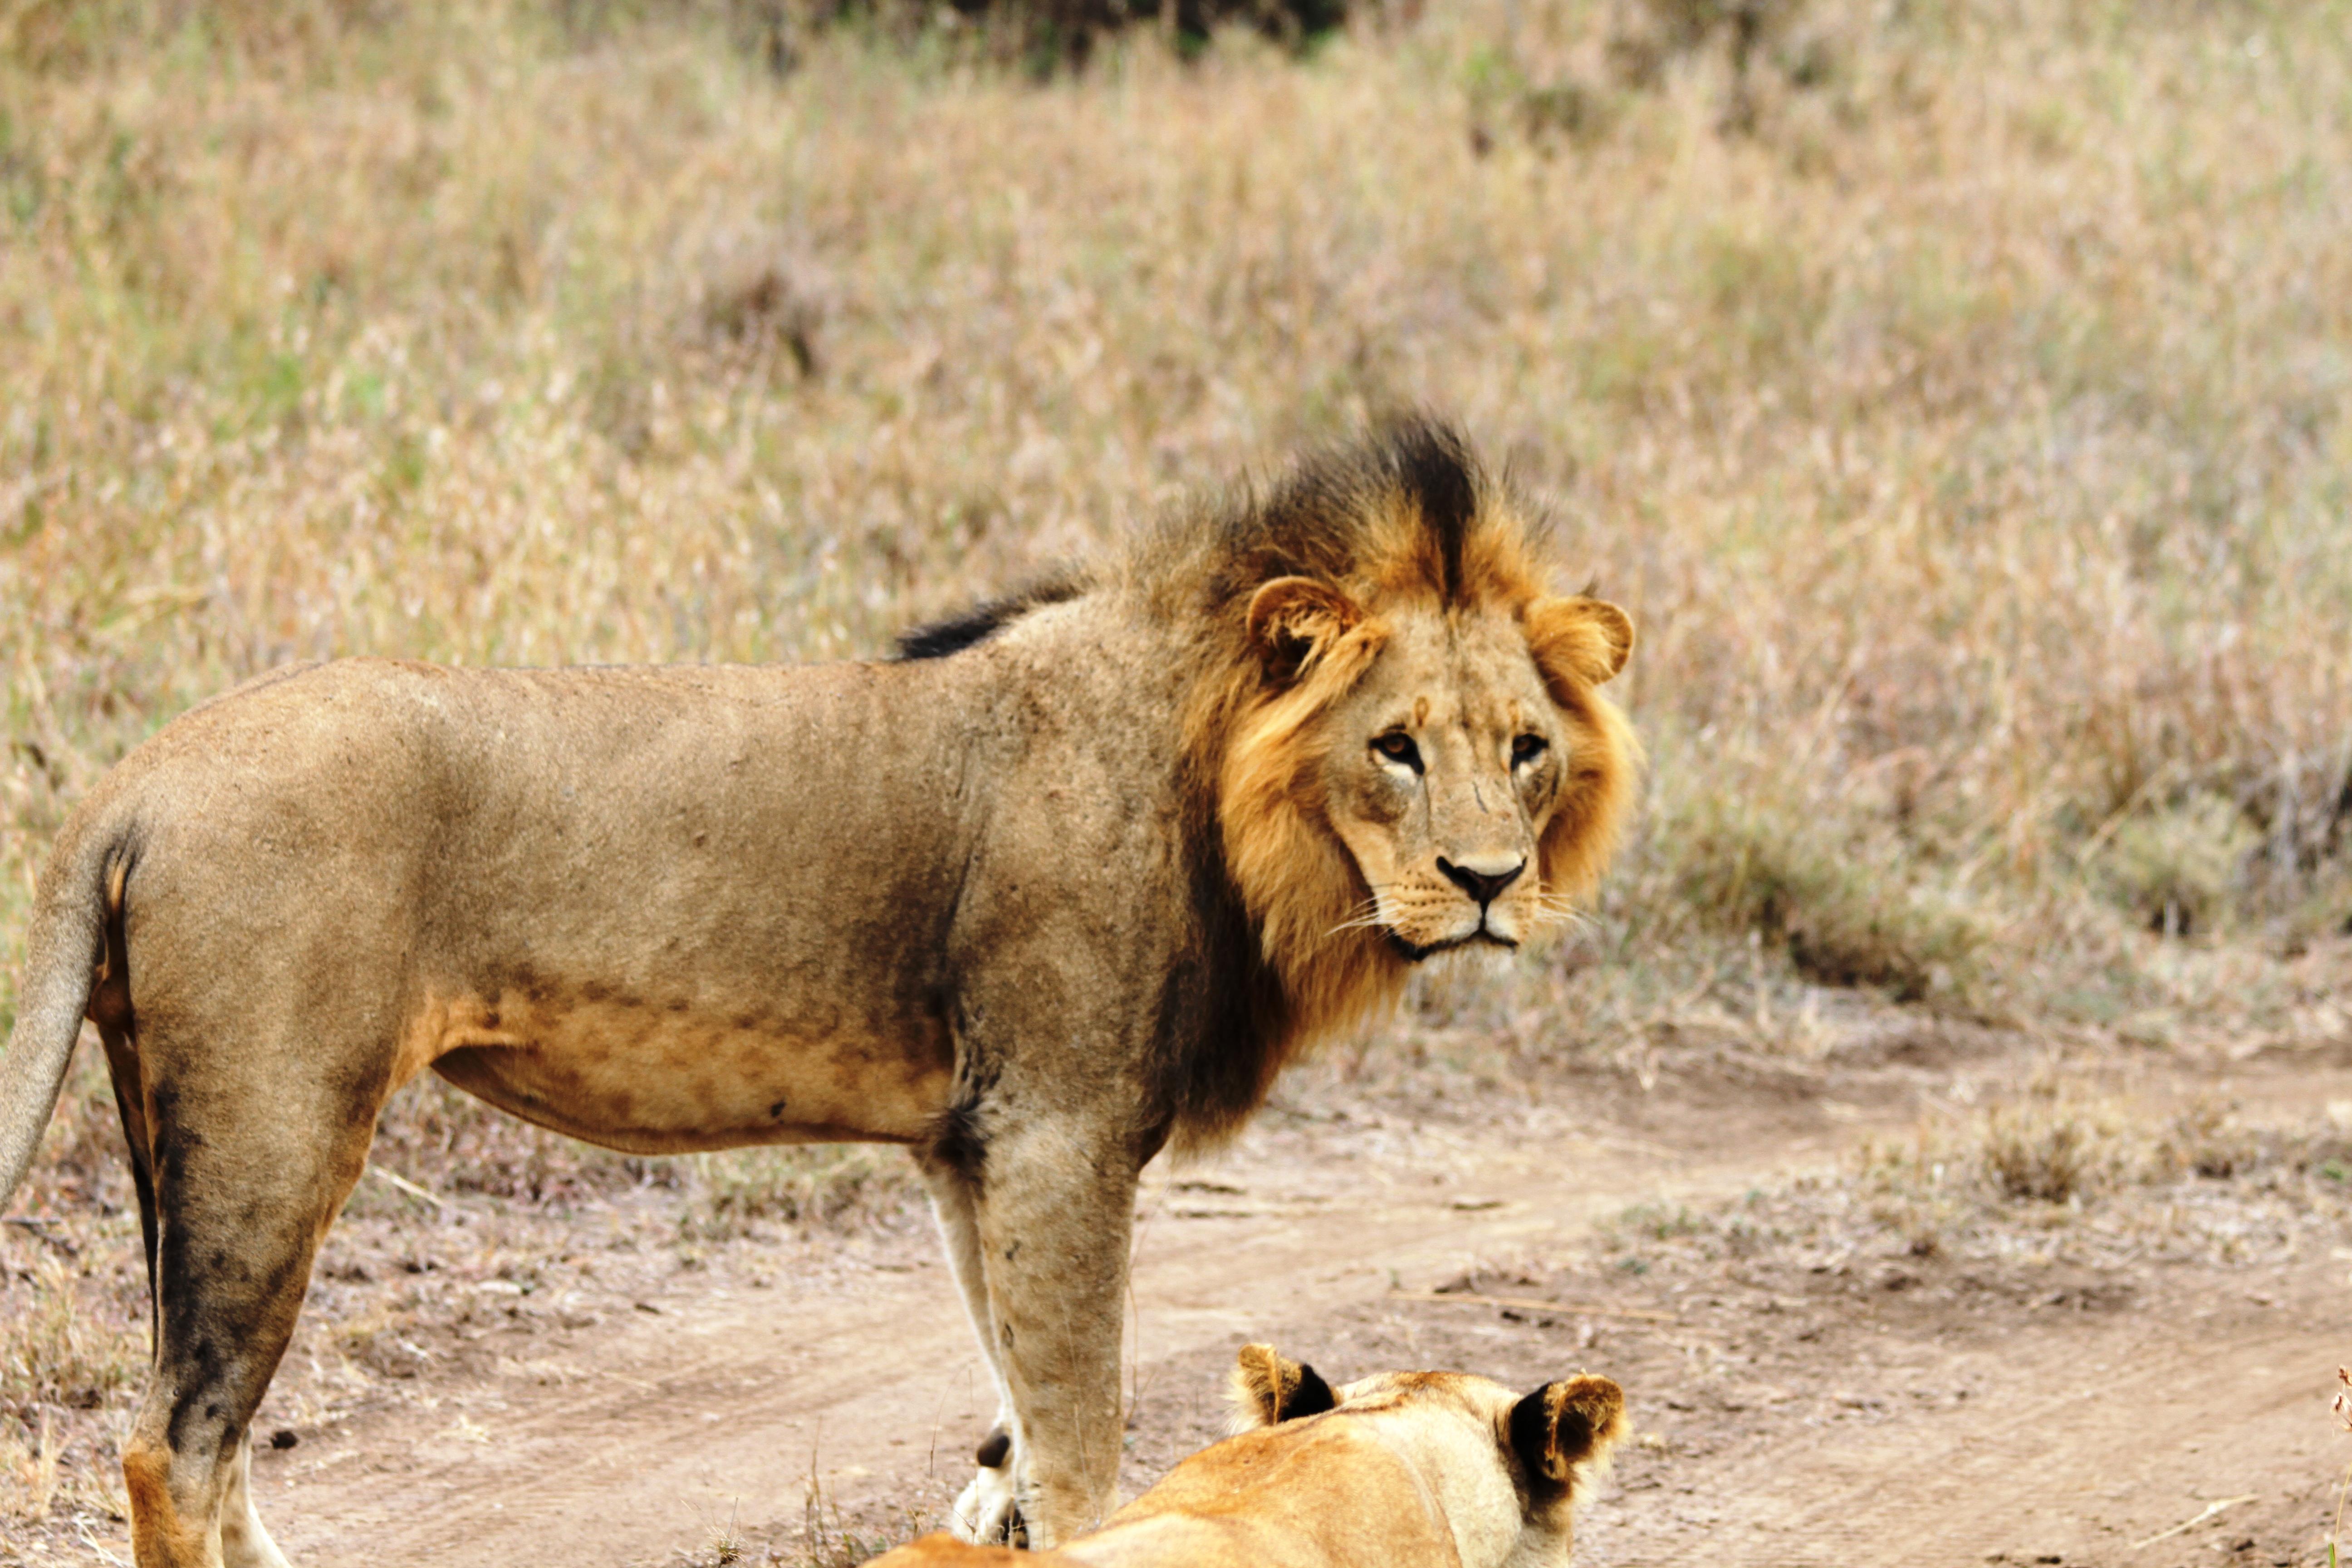 lion_kenya_copyrighted_2012_all_rights_reserved_photo_call_lucas_ferrara_nyreblog_com_.jpg